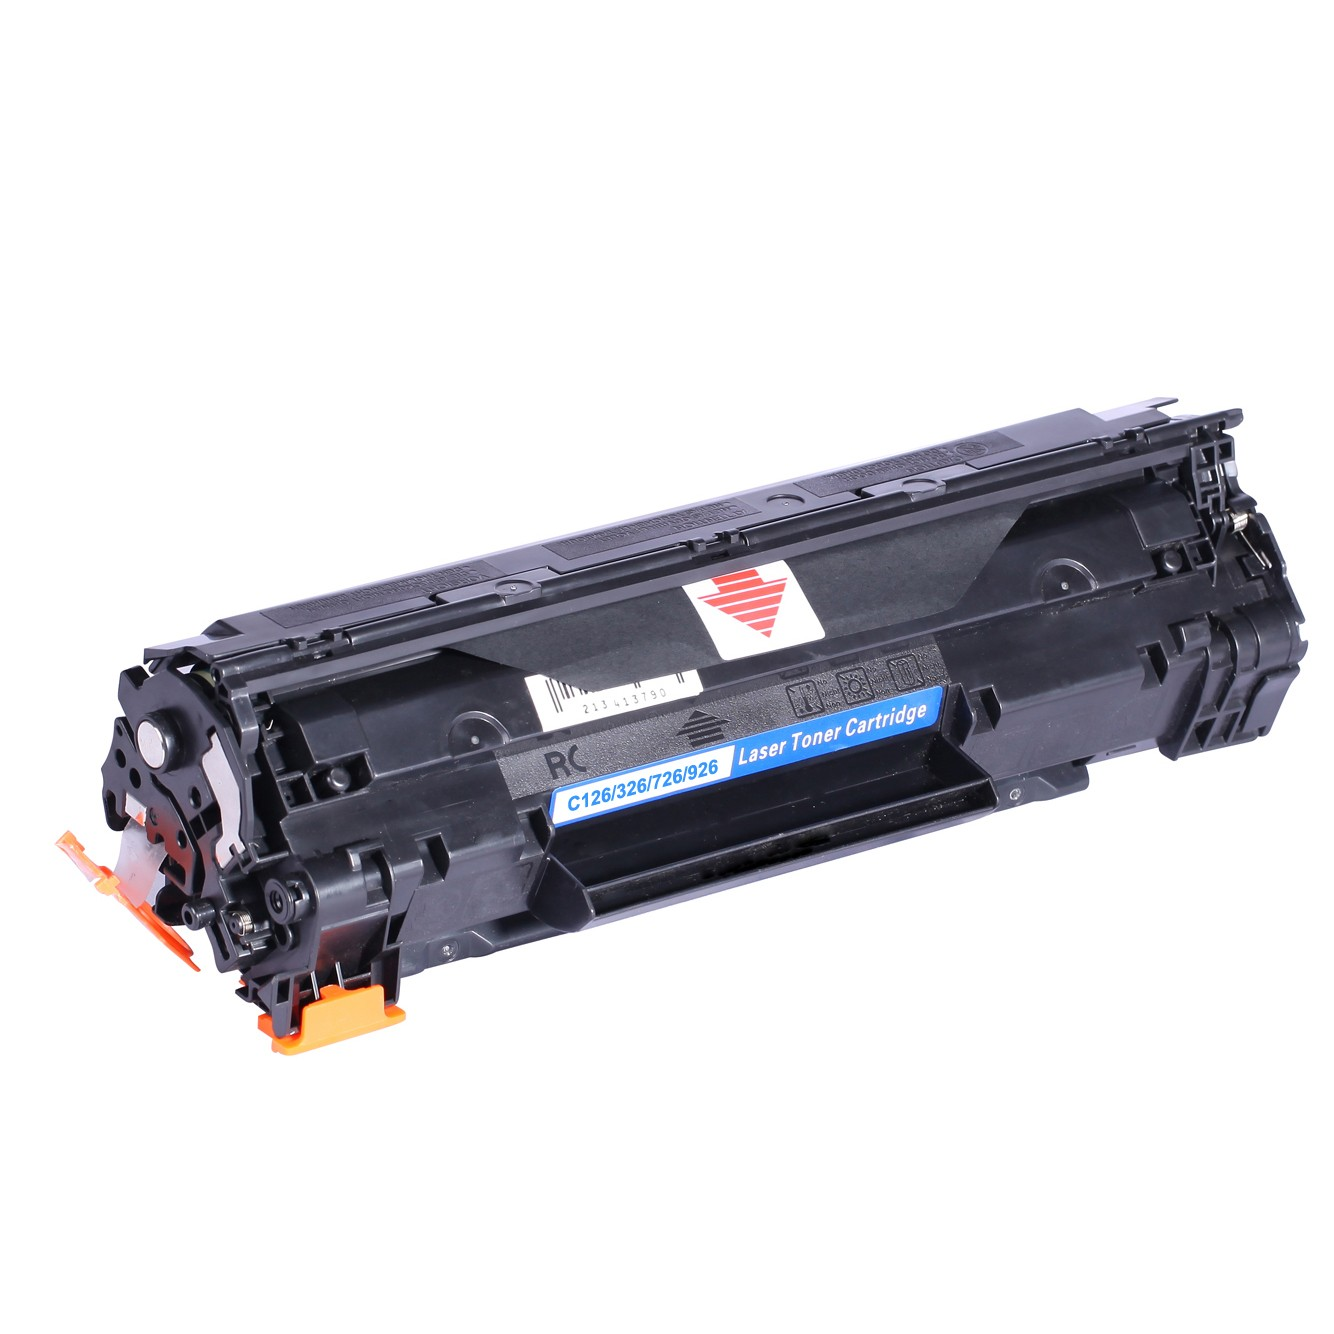 Image of   Canon CRG126/326/726/926 BK Lasertoner sort, kompatibel (2100 sider)